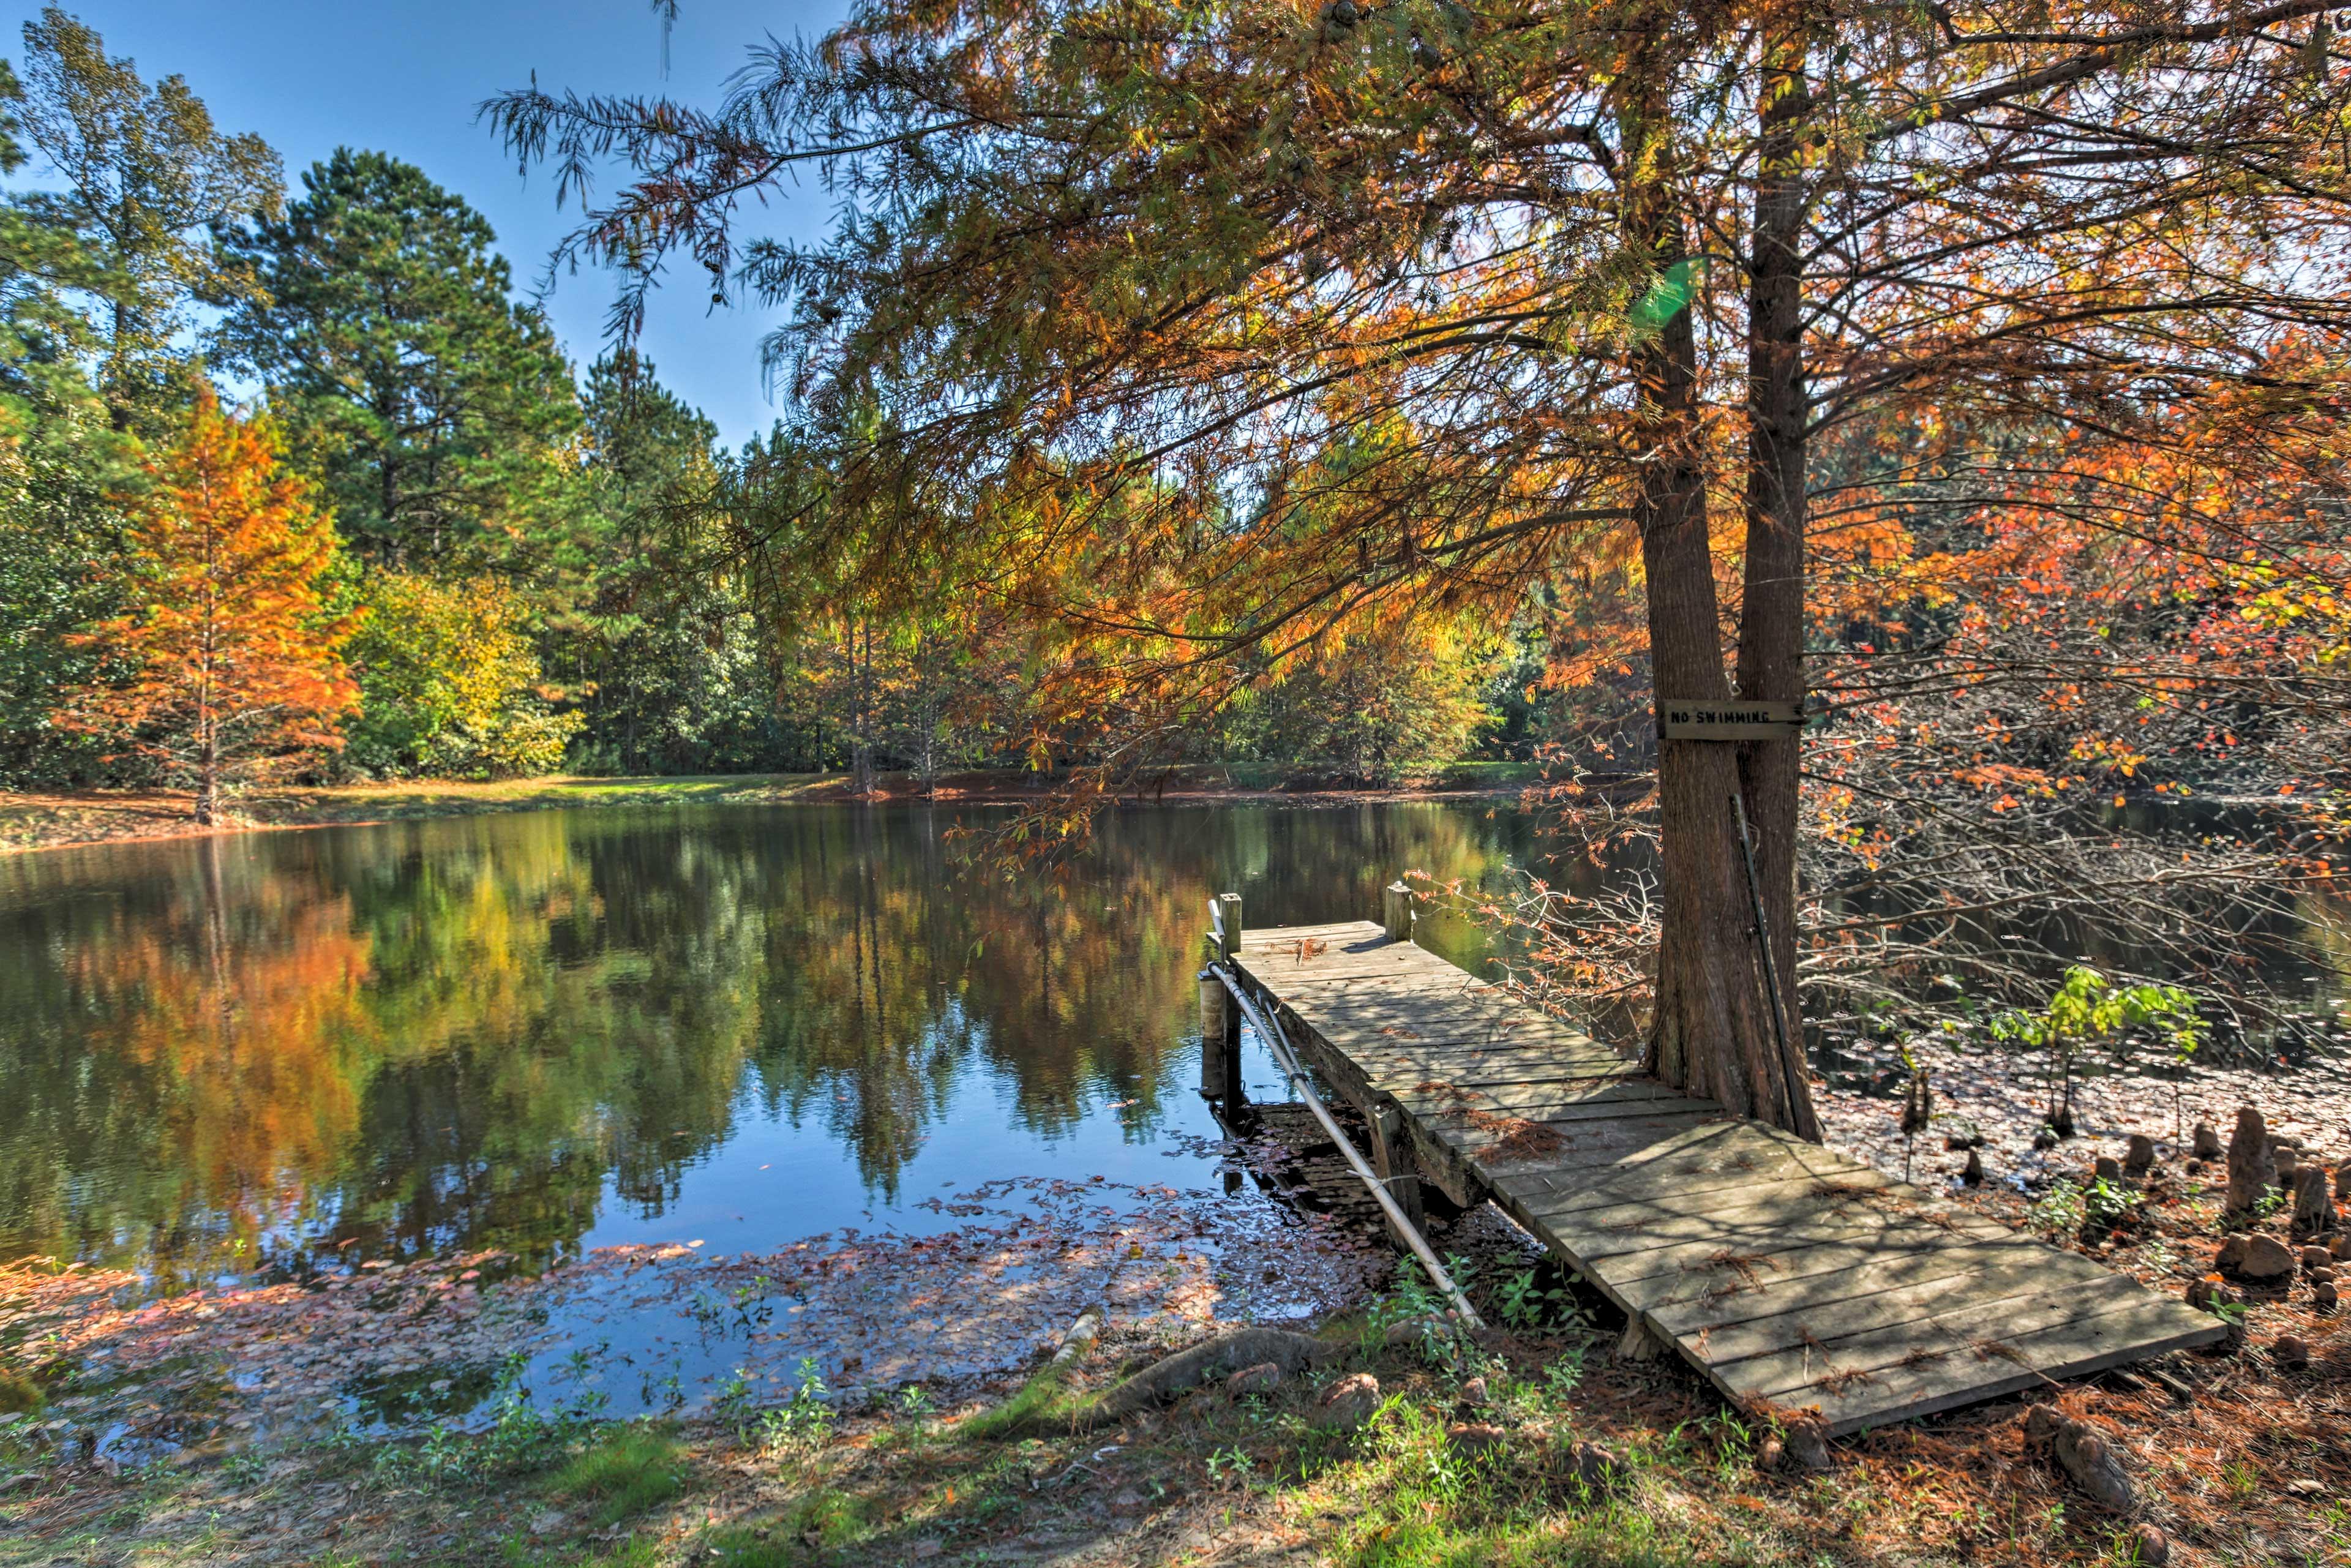 Spend your days fishing around this pristine pond.